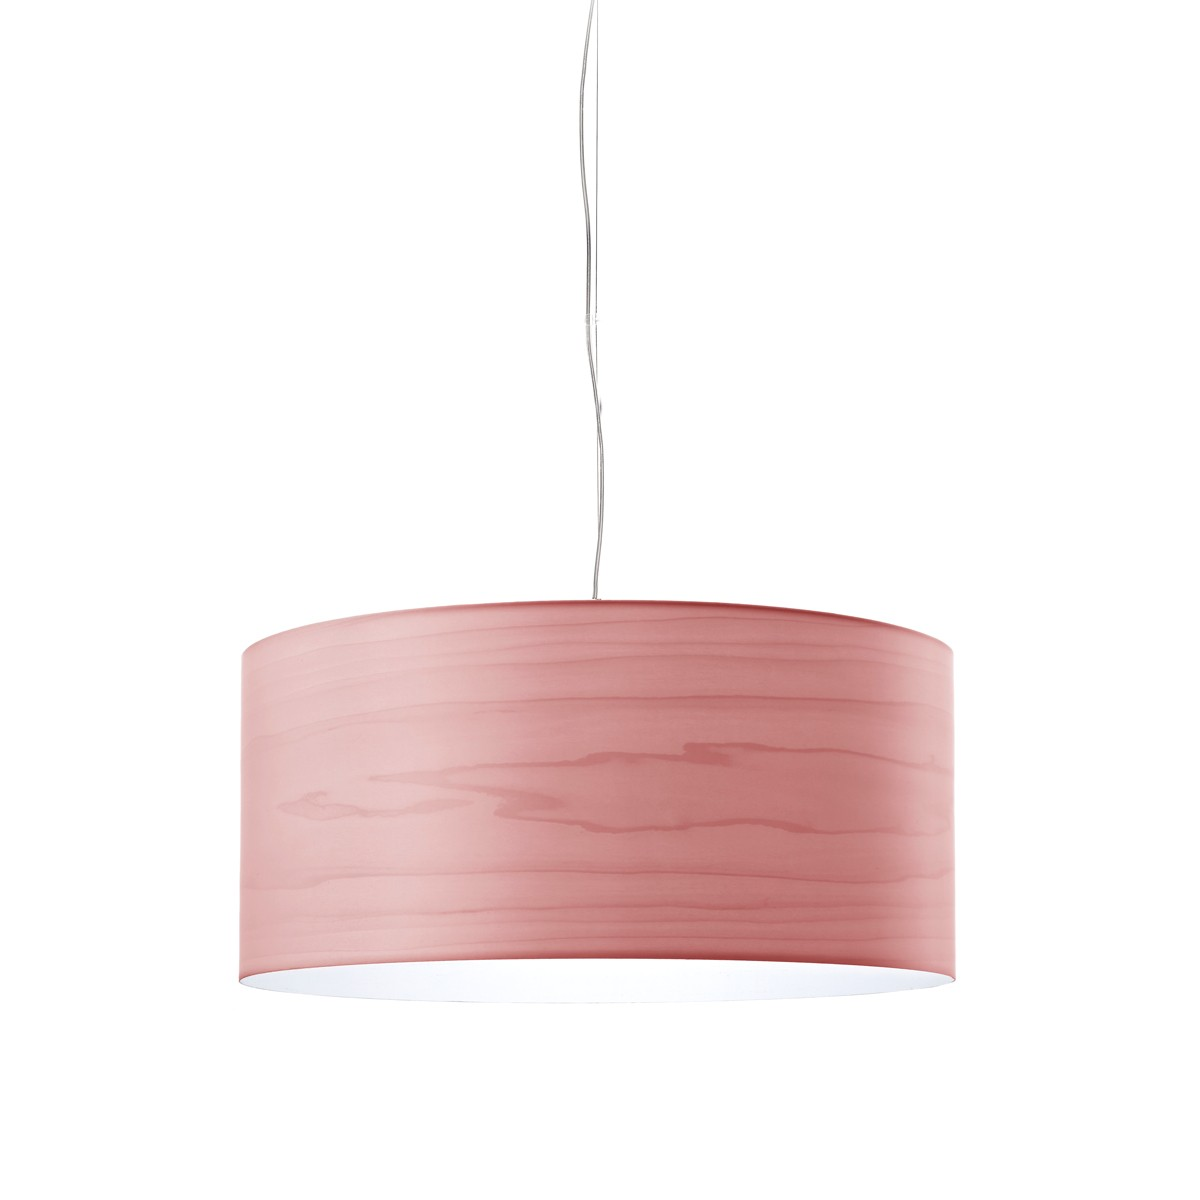 LZF Lamps Gea Small Pendelleuchte, pink